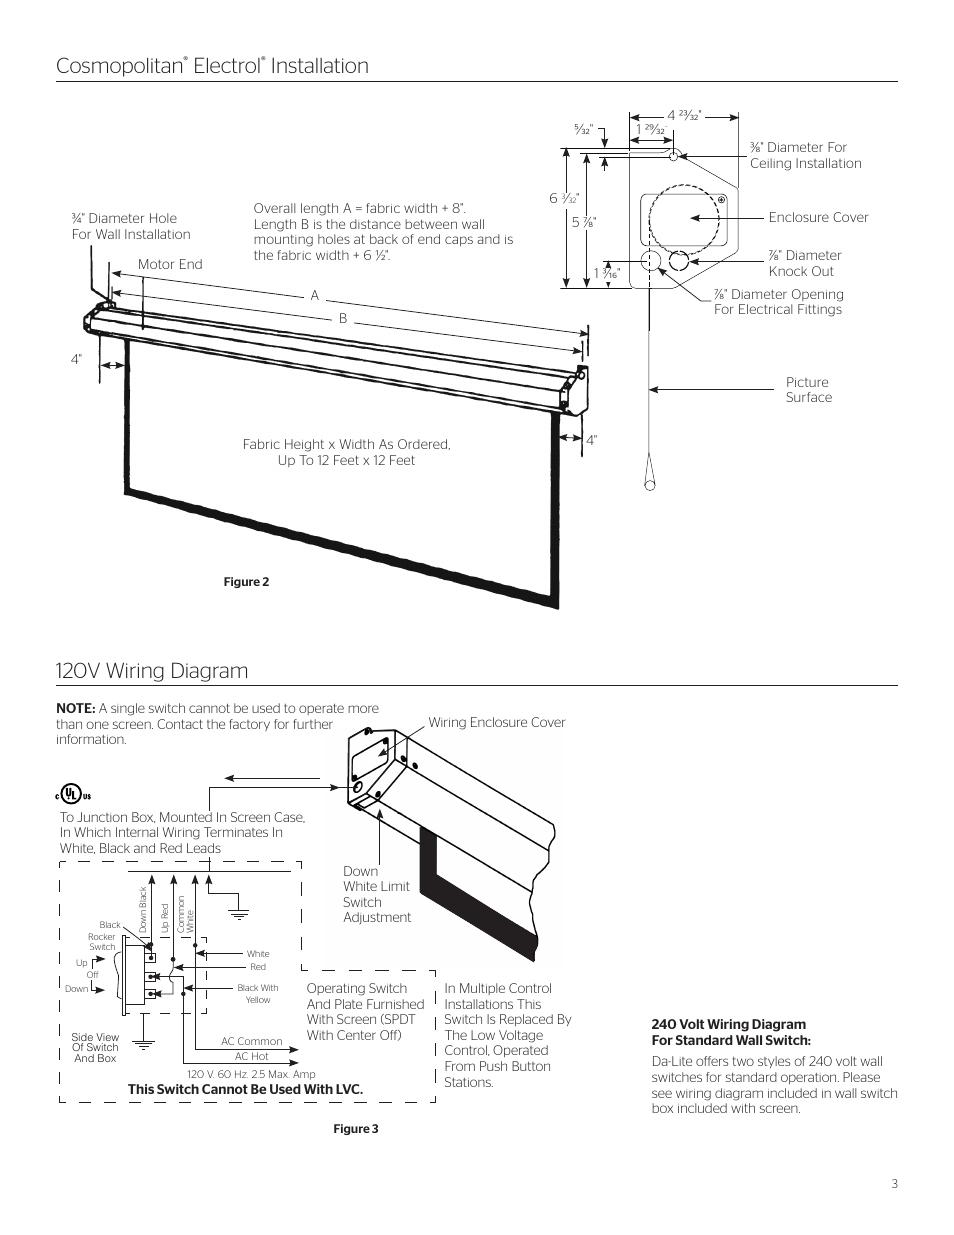 medium resolution of cosmopolitan electrol installation 120v wiring diagram da lite cosmopolitan electrol user manual page 3 8